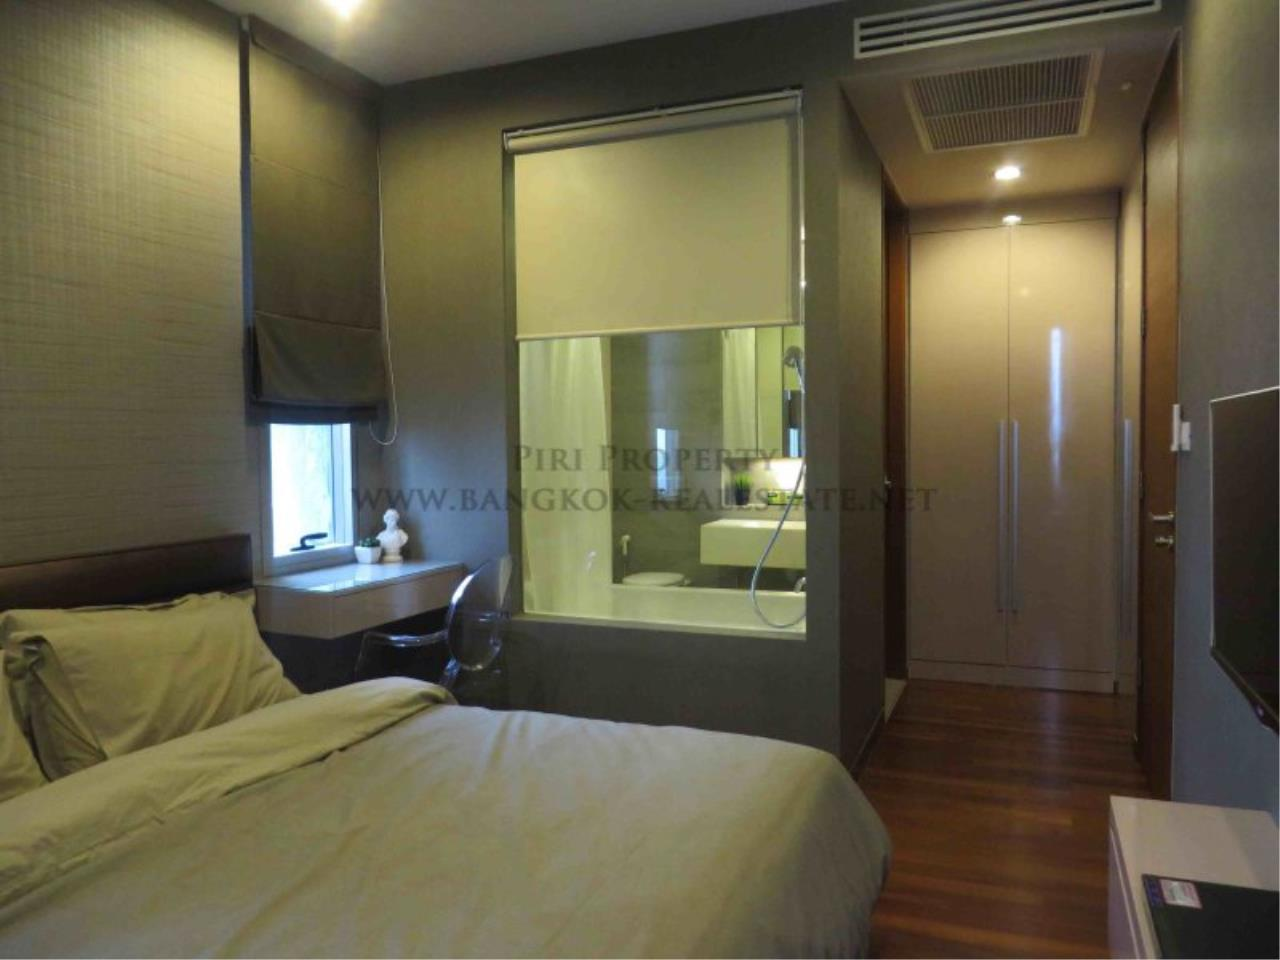 Piri Property Agency's Ashton Morph 38 - Exclusive 2 bedroom in Thonglor for Rent 12